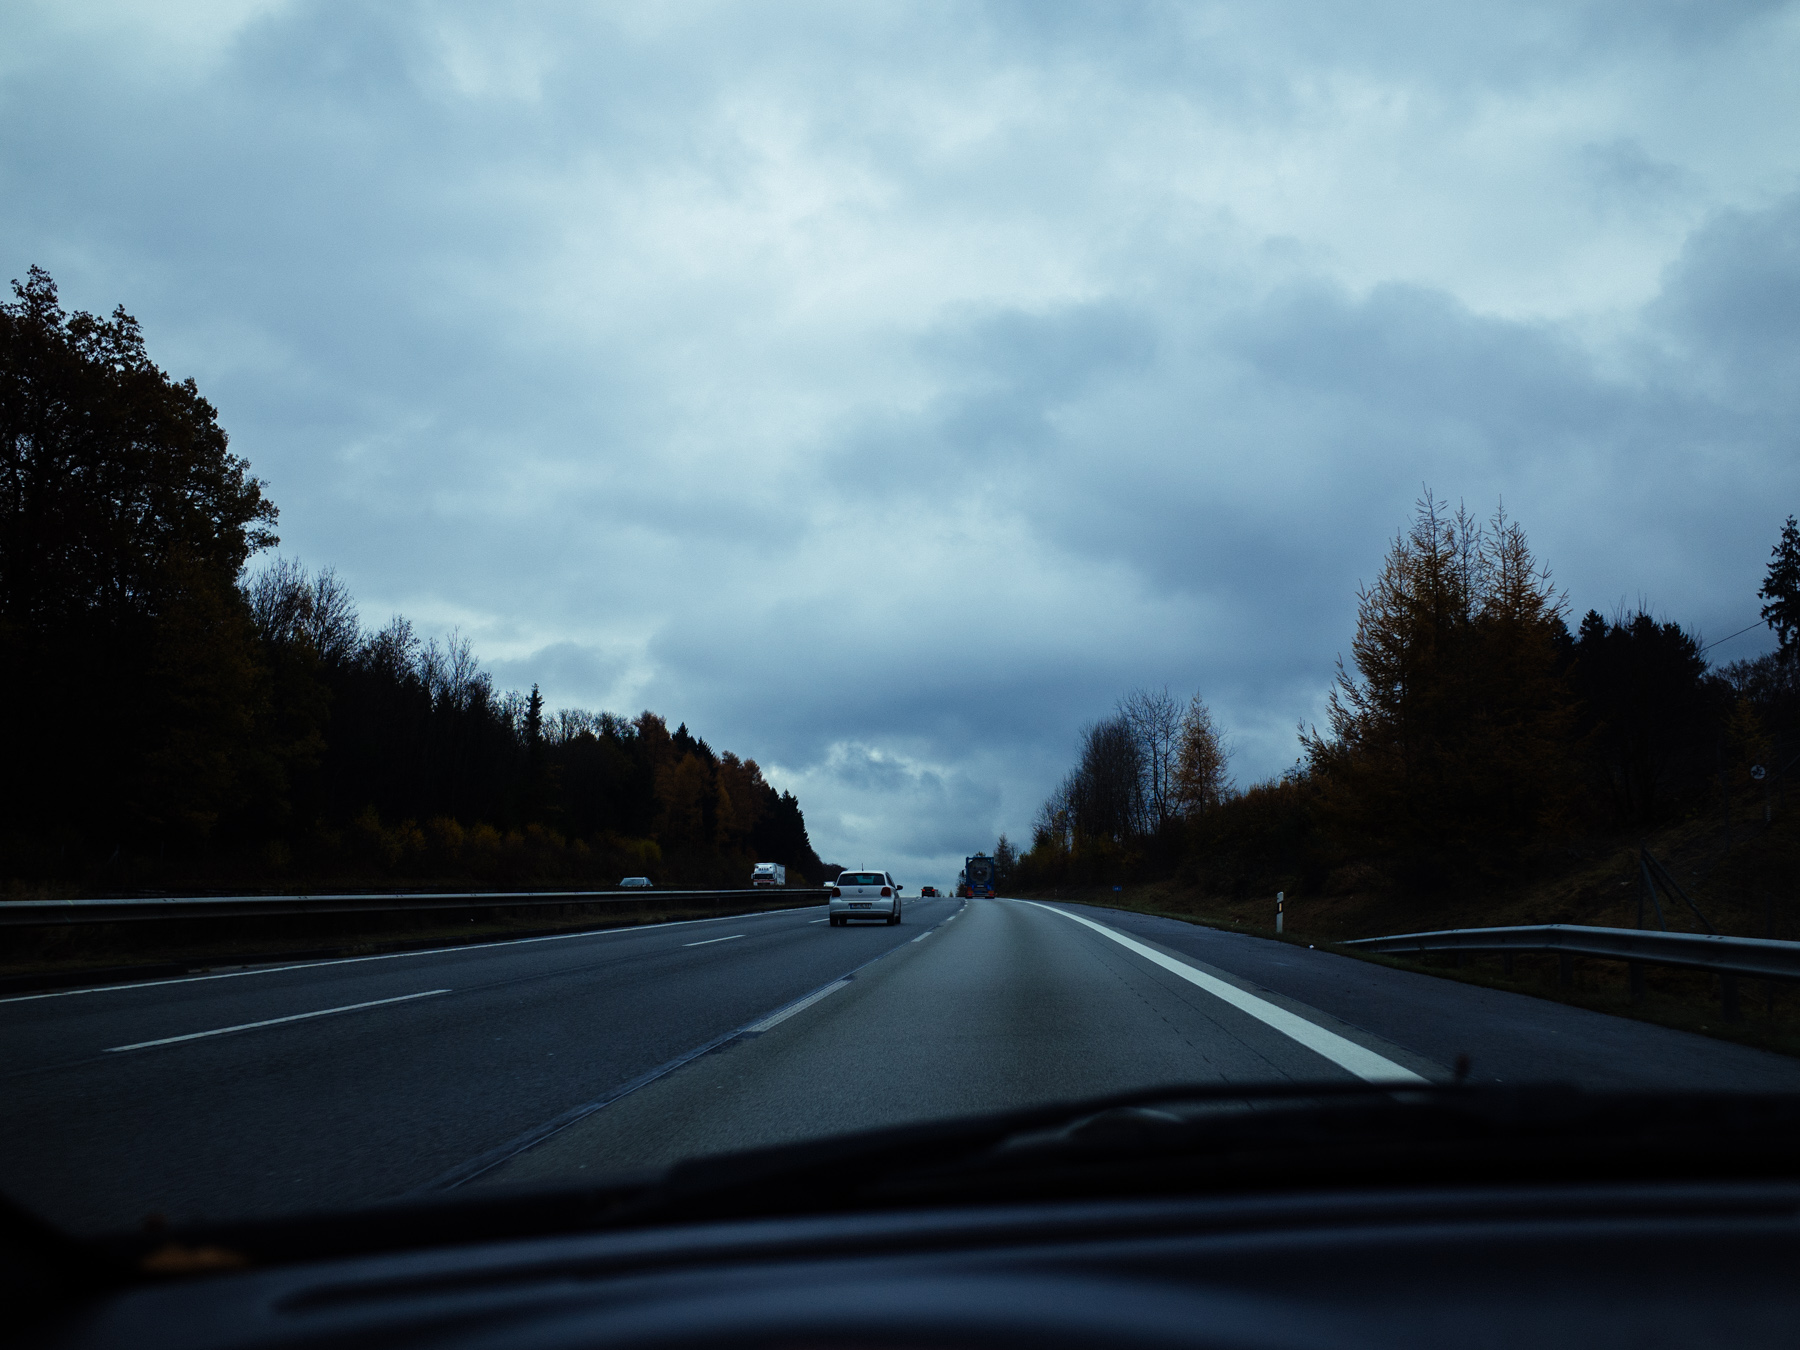 andre-duhme-fotograf-autobahn-mu%cc%88nchen_r014151